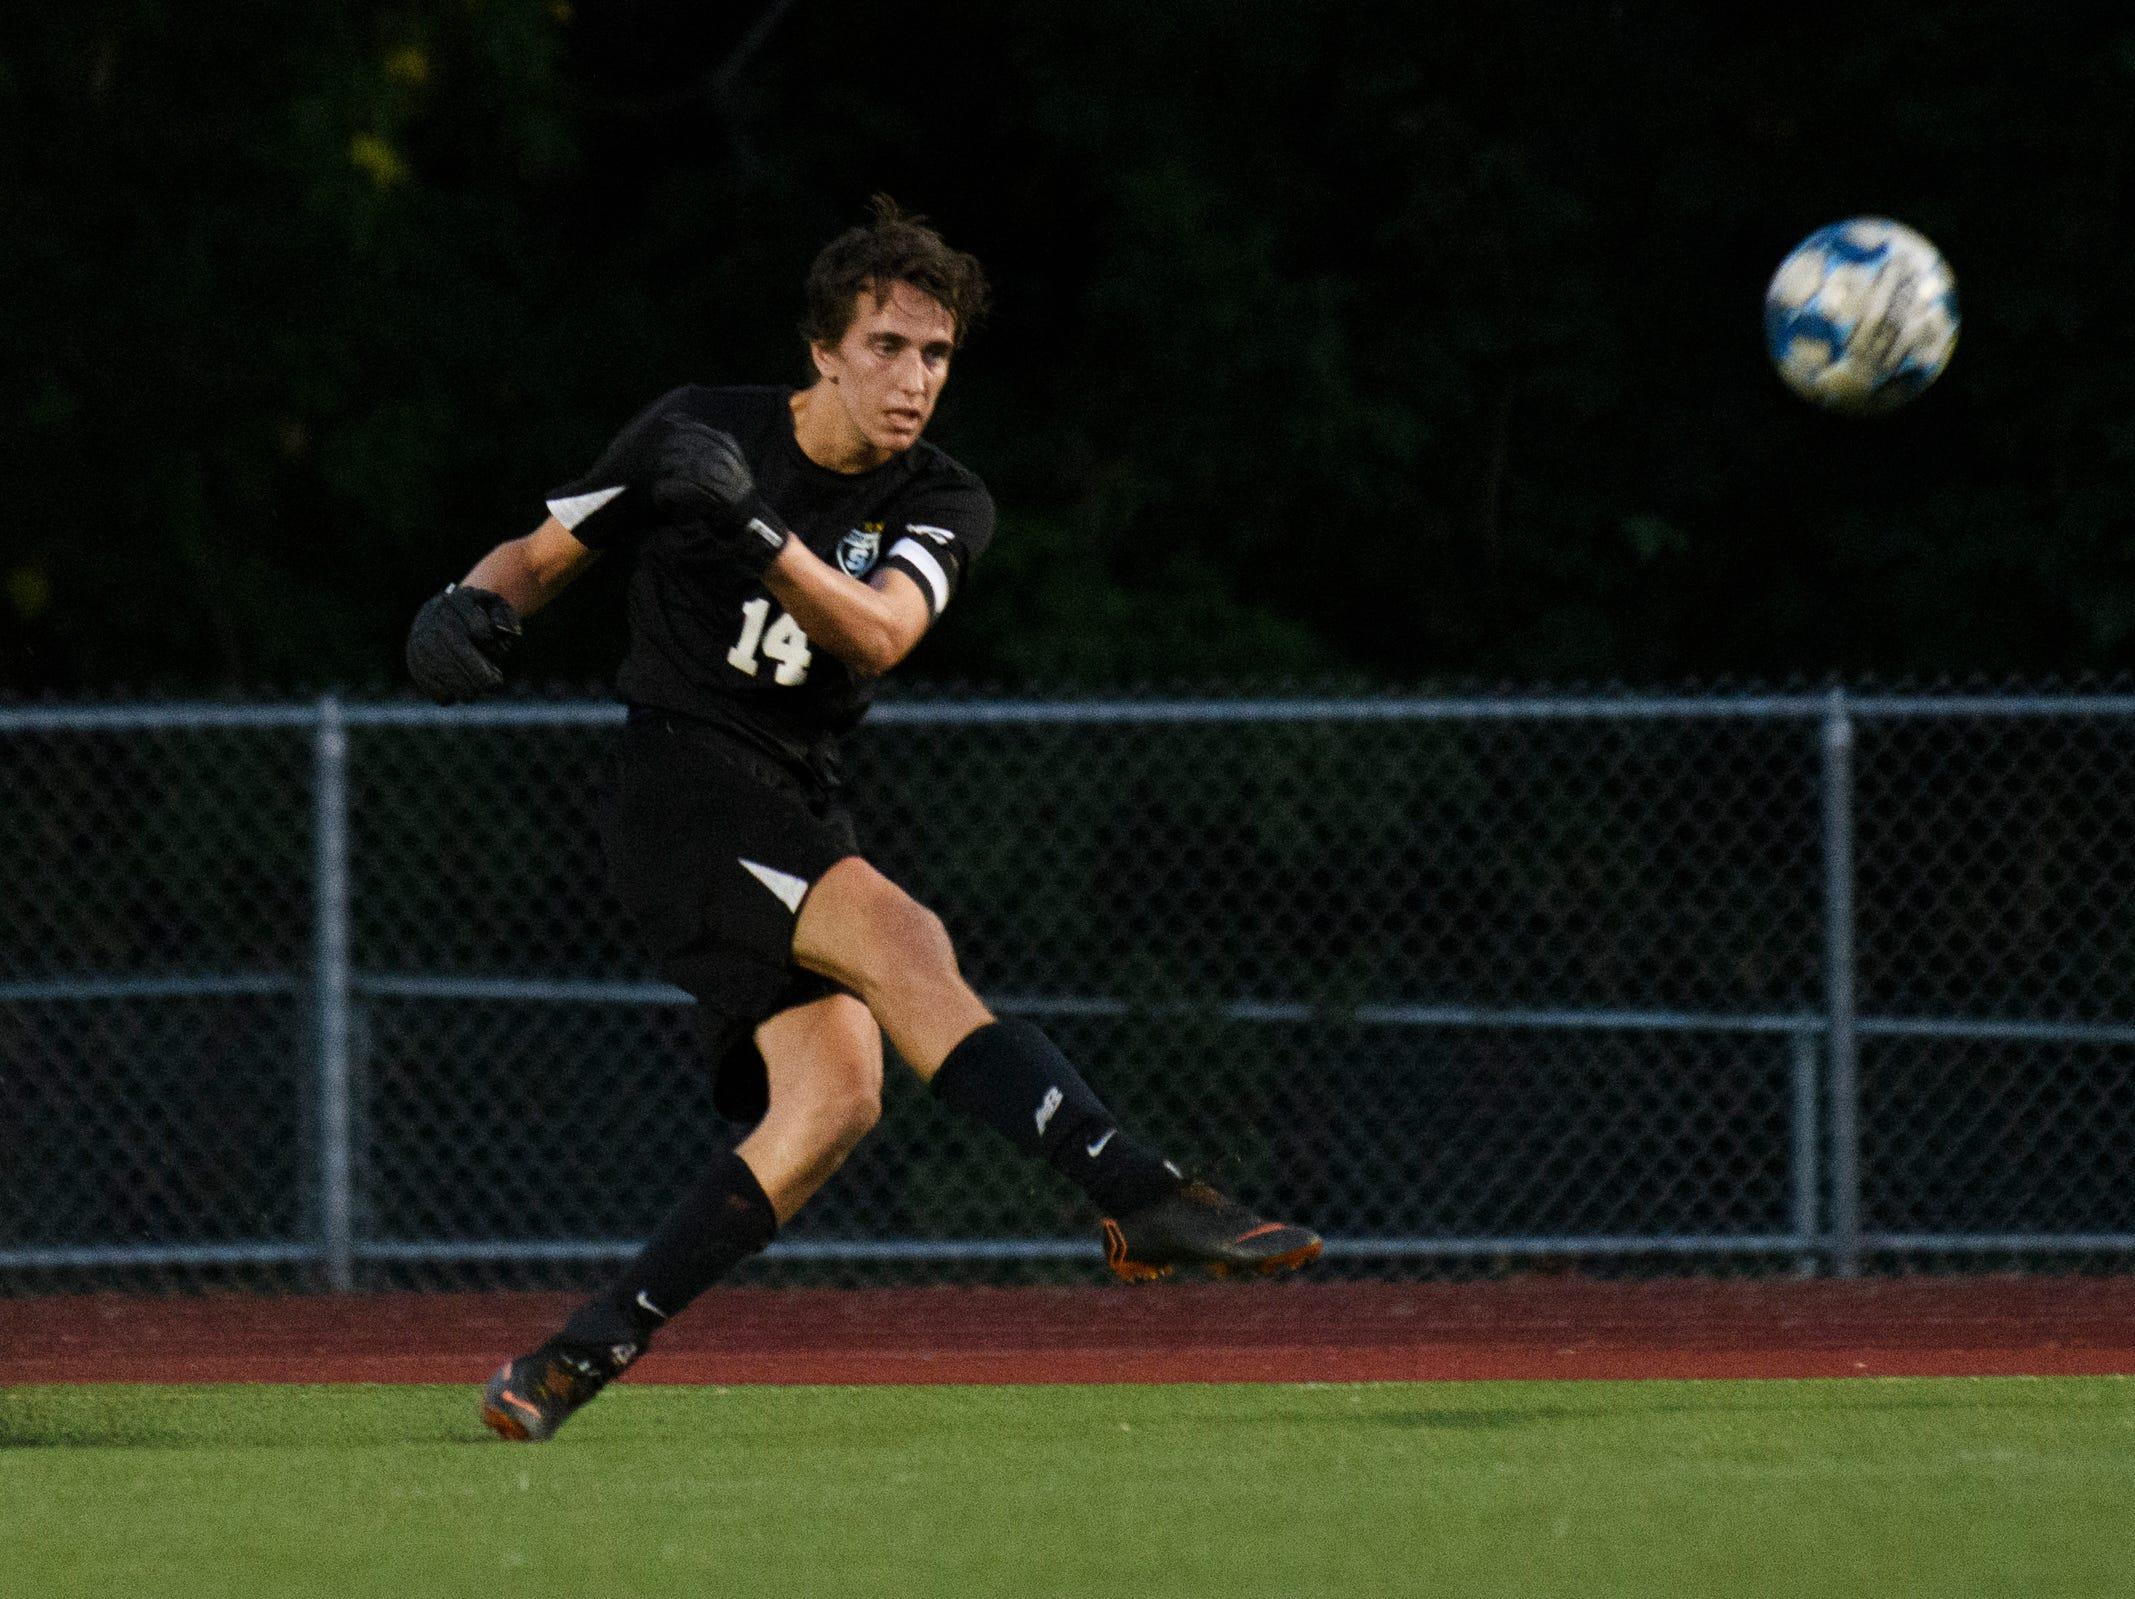 Stowe goalie Samuel Schoepke kicks the ball during the boys soccer game between Stowe and Burlington at Buck Hard field on Wednesday night September 5, 2018 in Burlington.